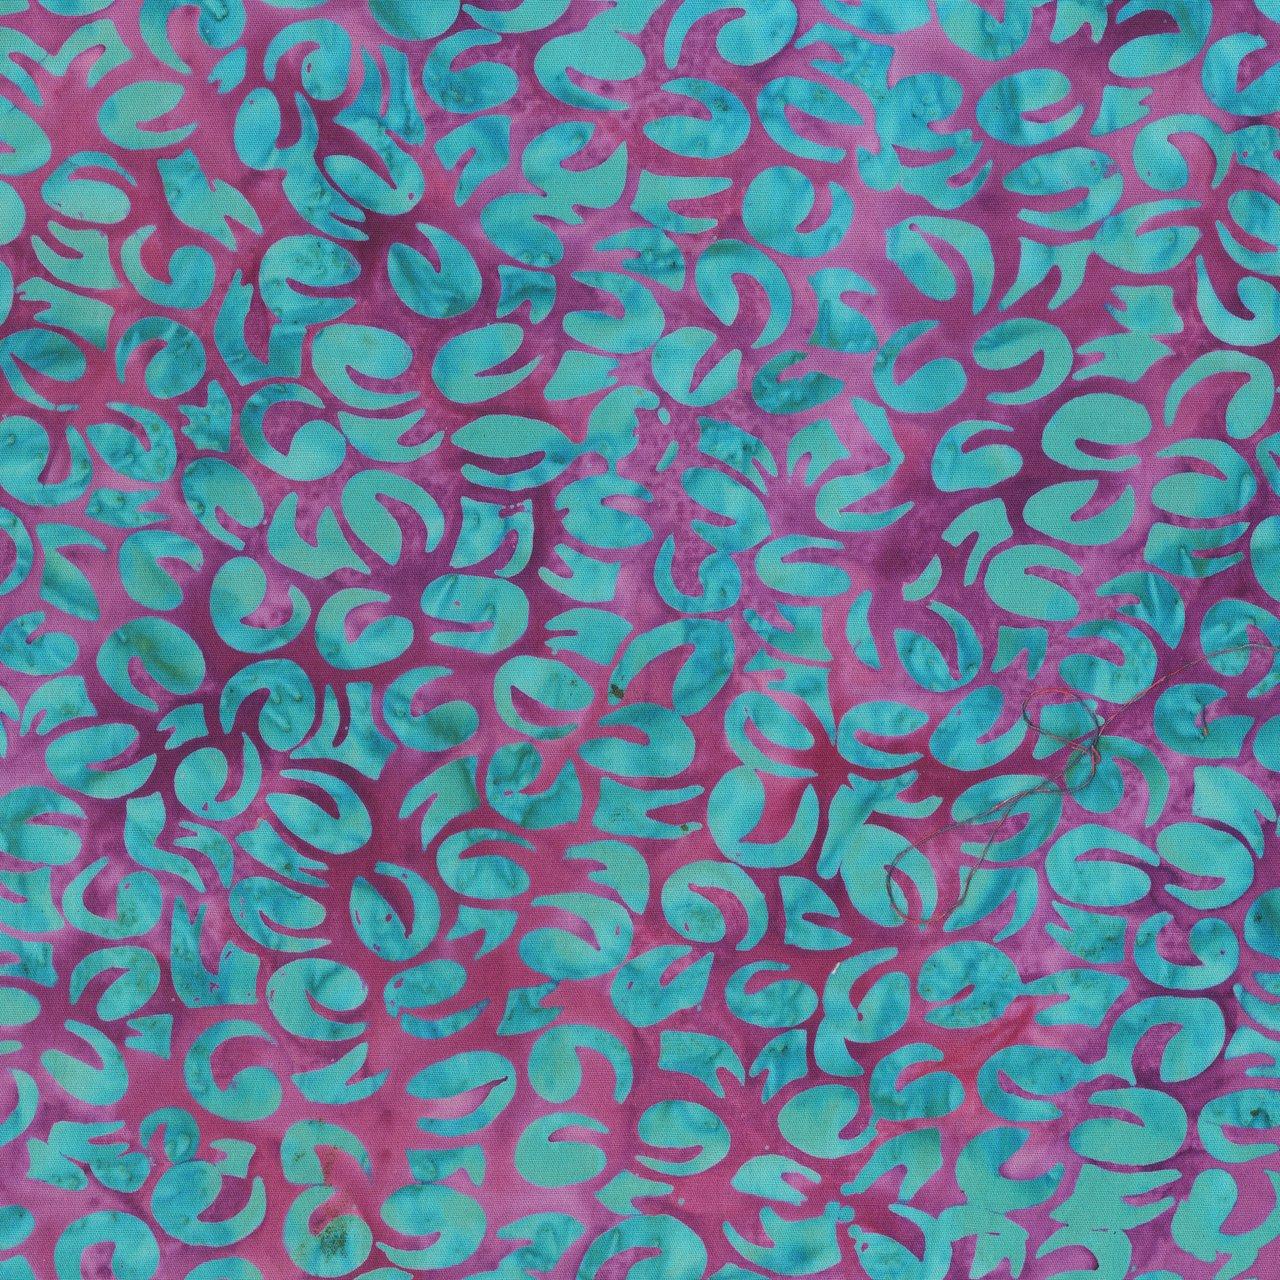 2027Q-2 Art Inspired: Northern Blooms by Erin Hanson